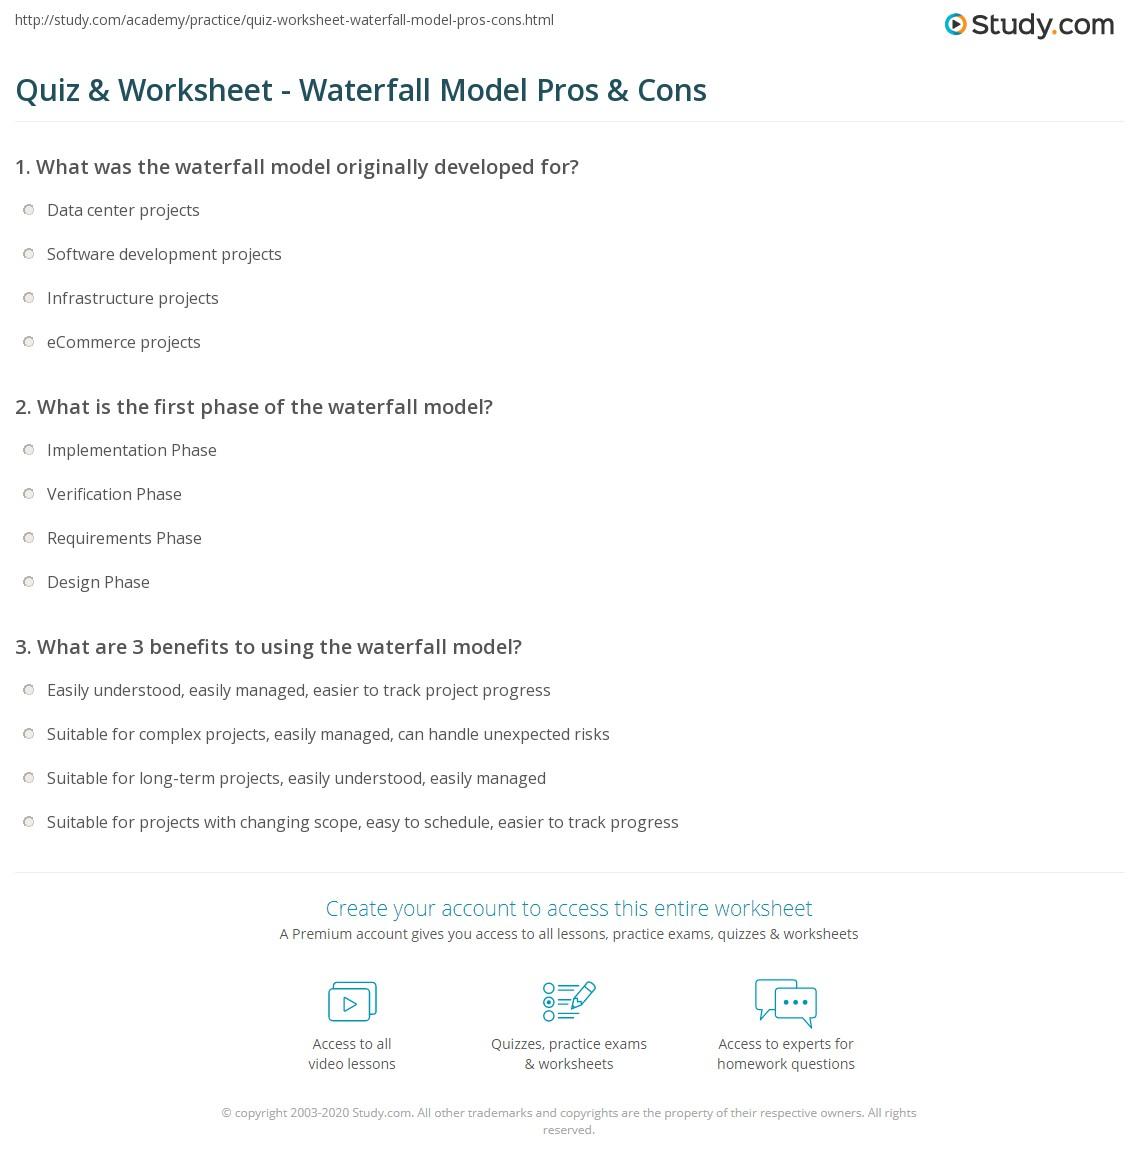 Quiz Worksheet Waterfall Model Pros Cons Study Com